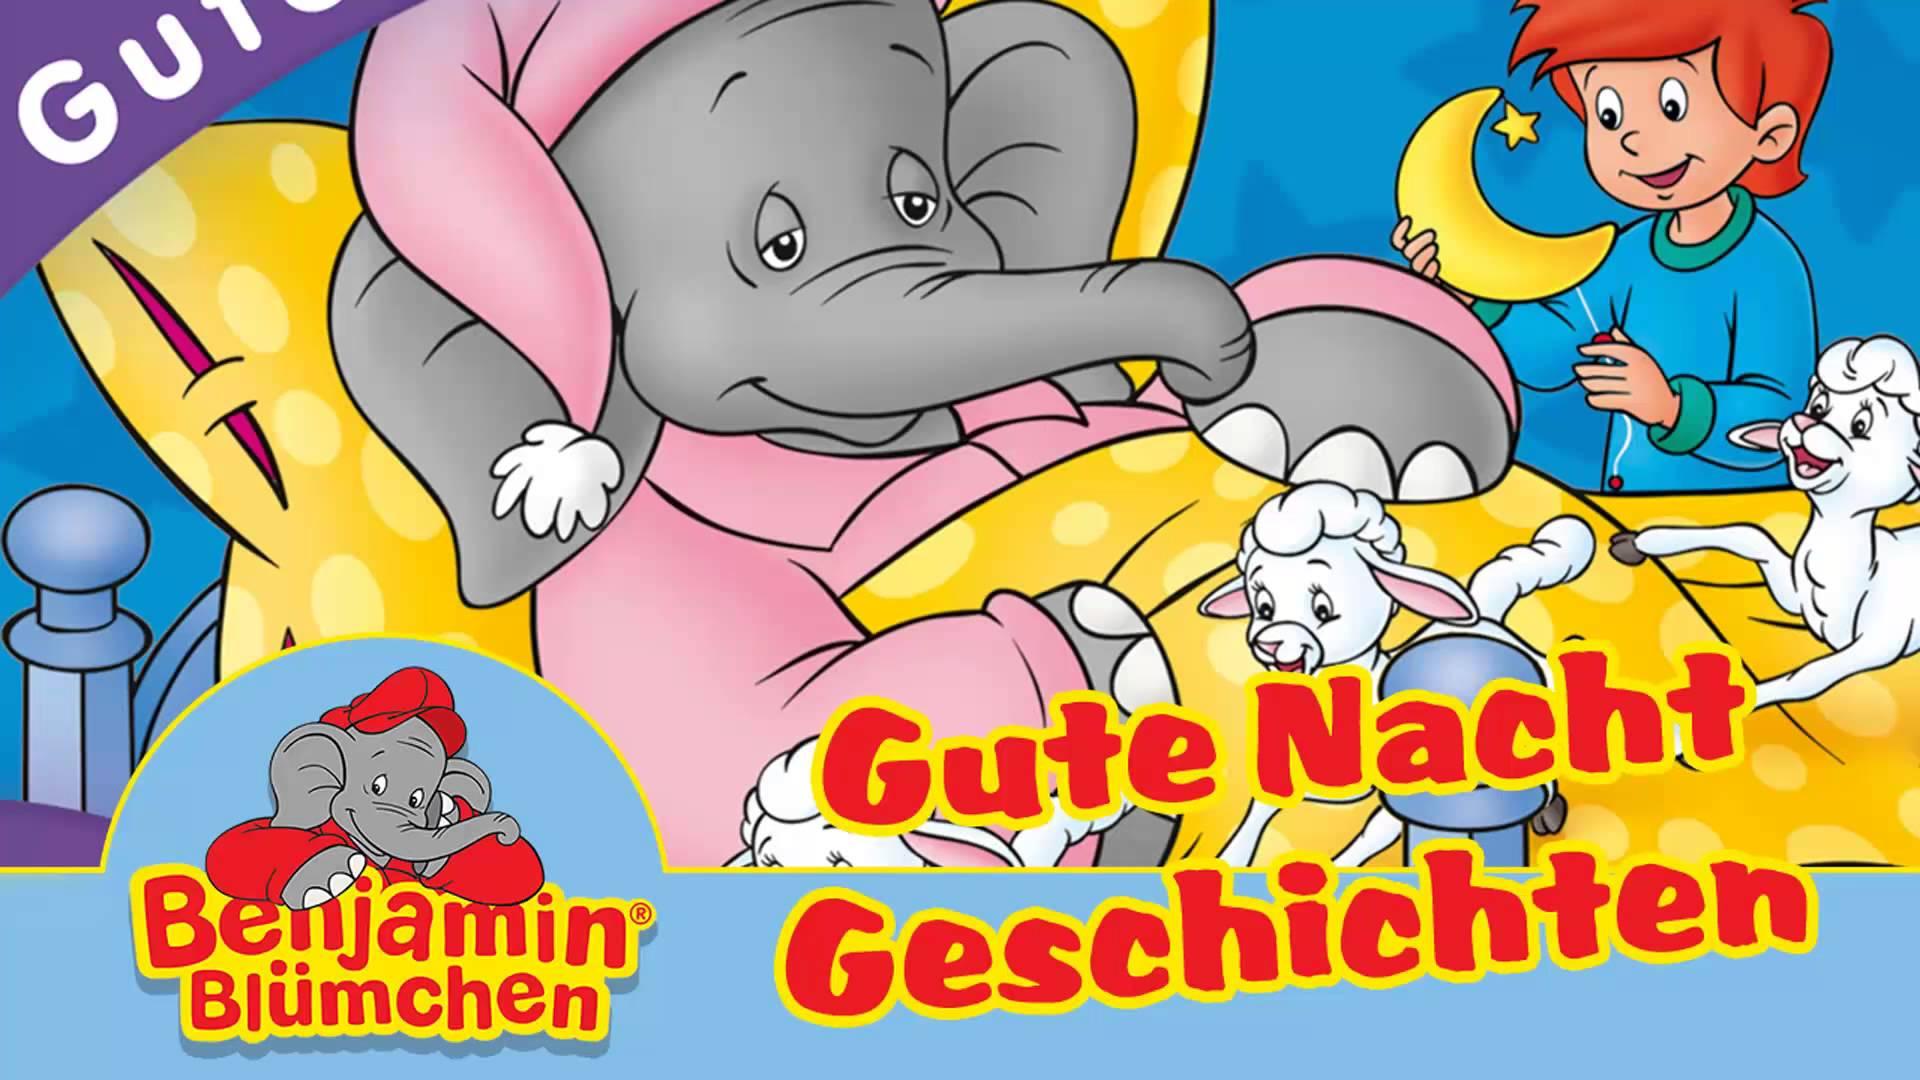 Gute nacht geschichte clipart clipart freeuse library Benjamin Blümchen - Gute Nacht im Zoo - Gute Nacht Geschichten ... clipart freeuse library